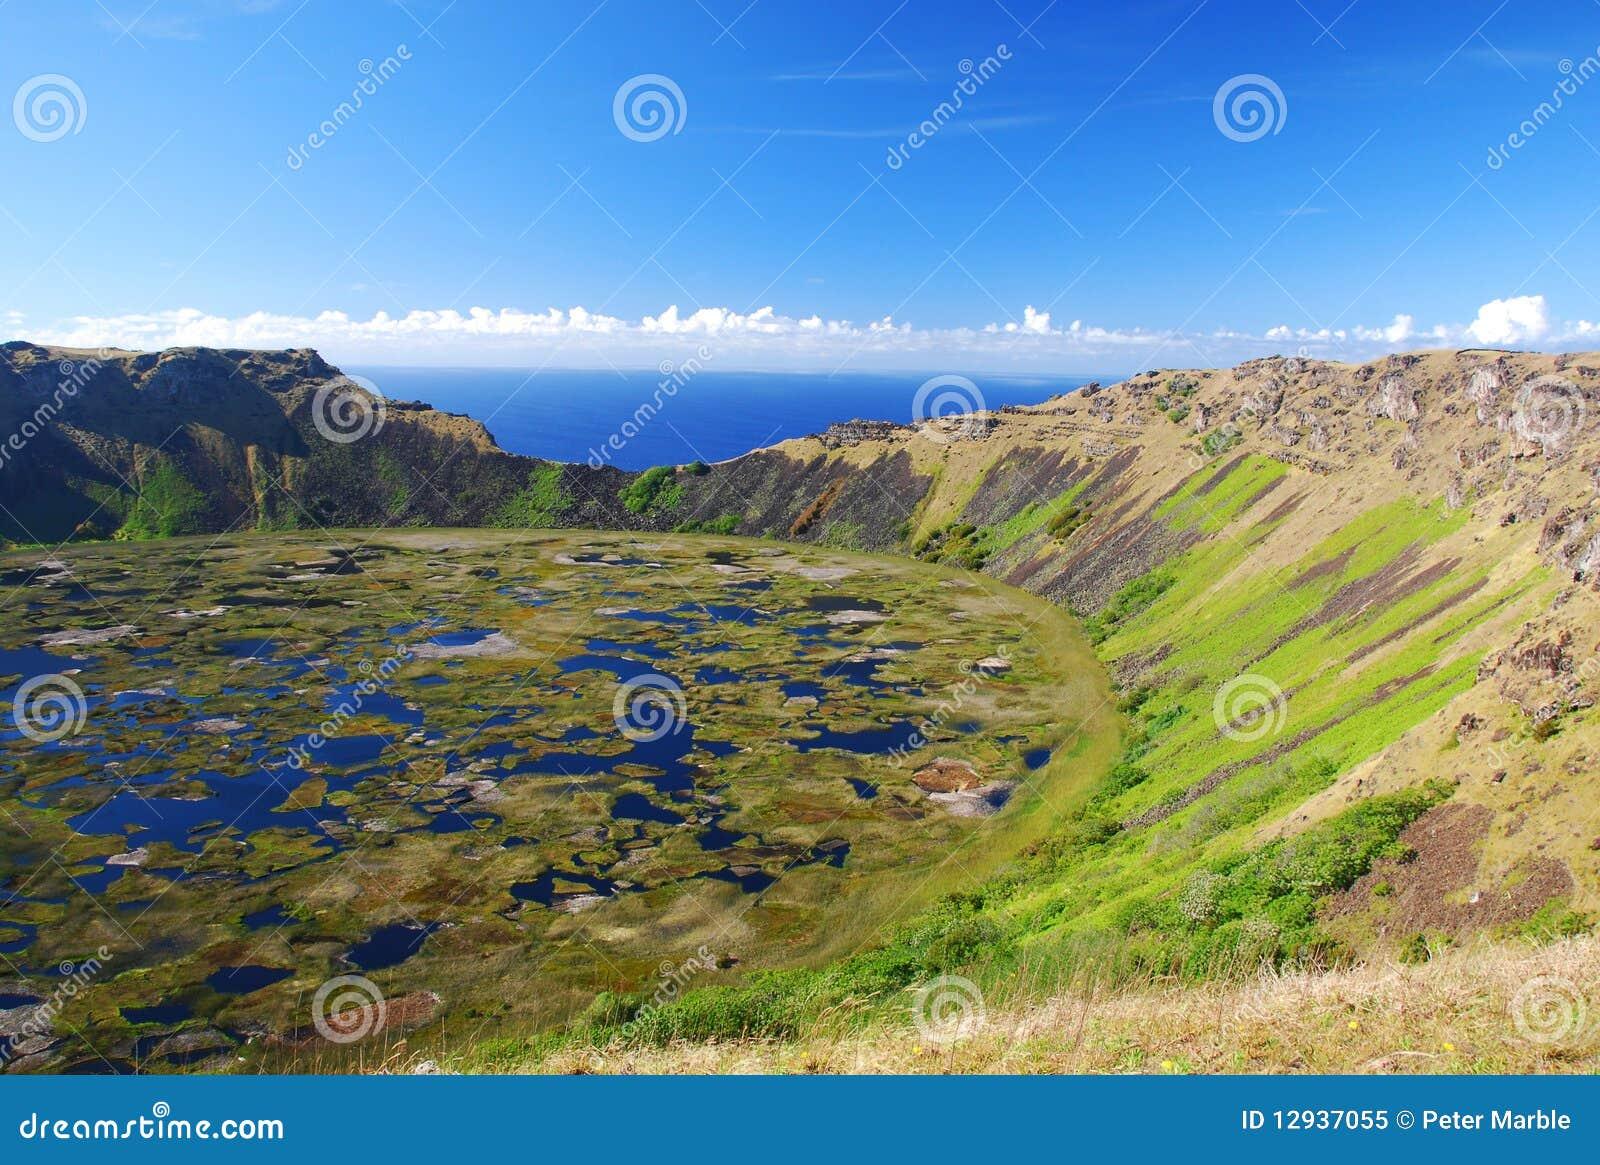 Rano kau crater lake - easter island (rapa nui)